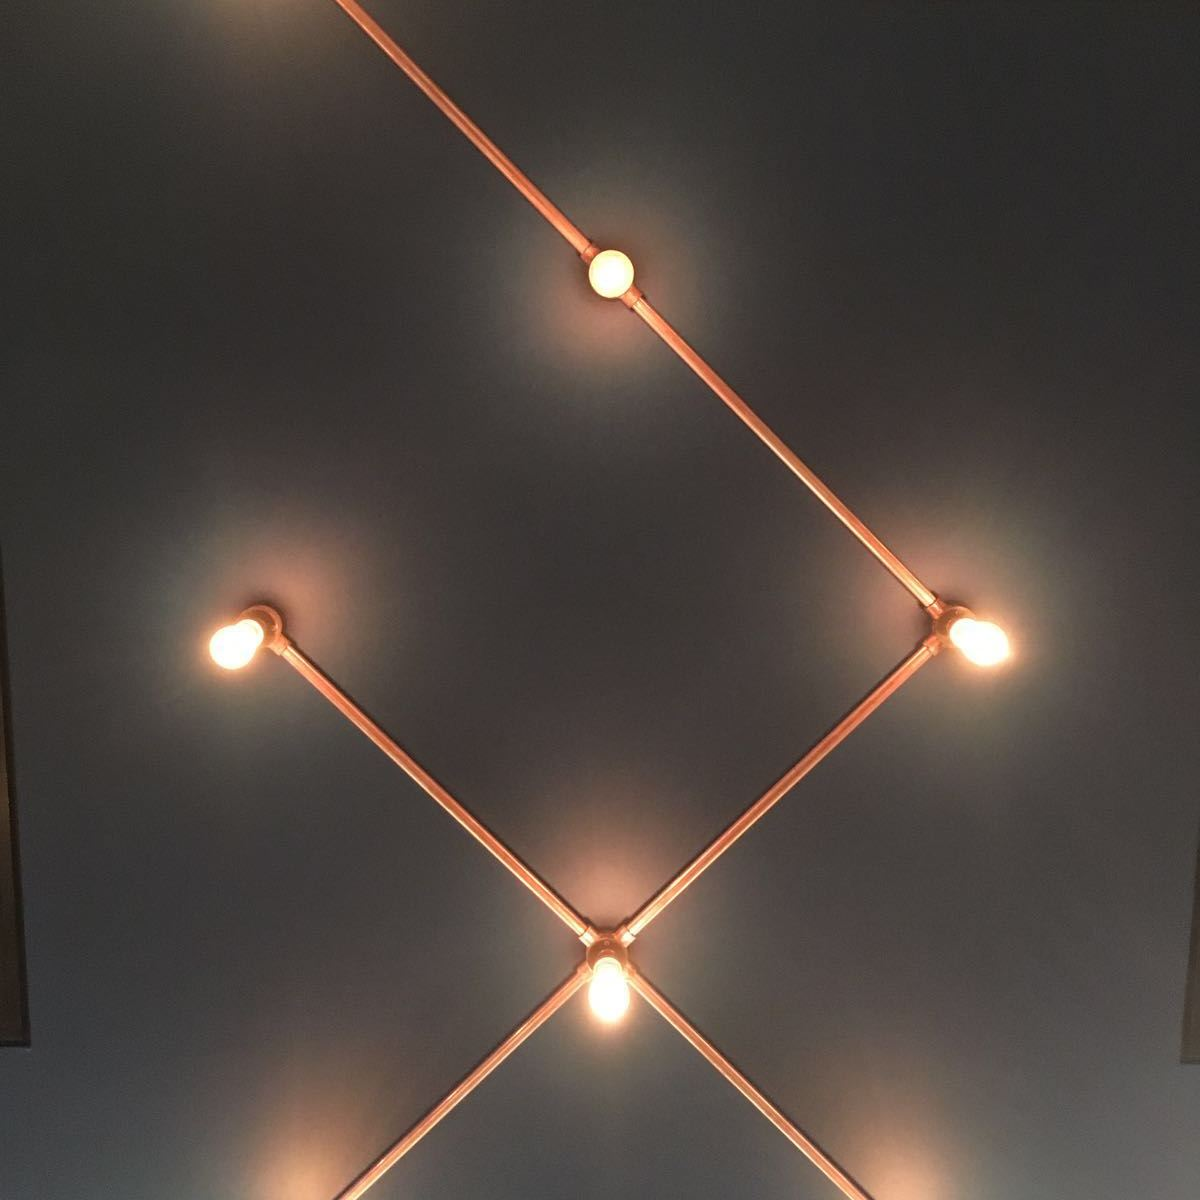 Conduit lighting - copper